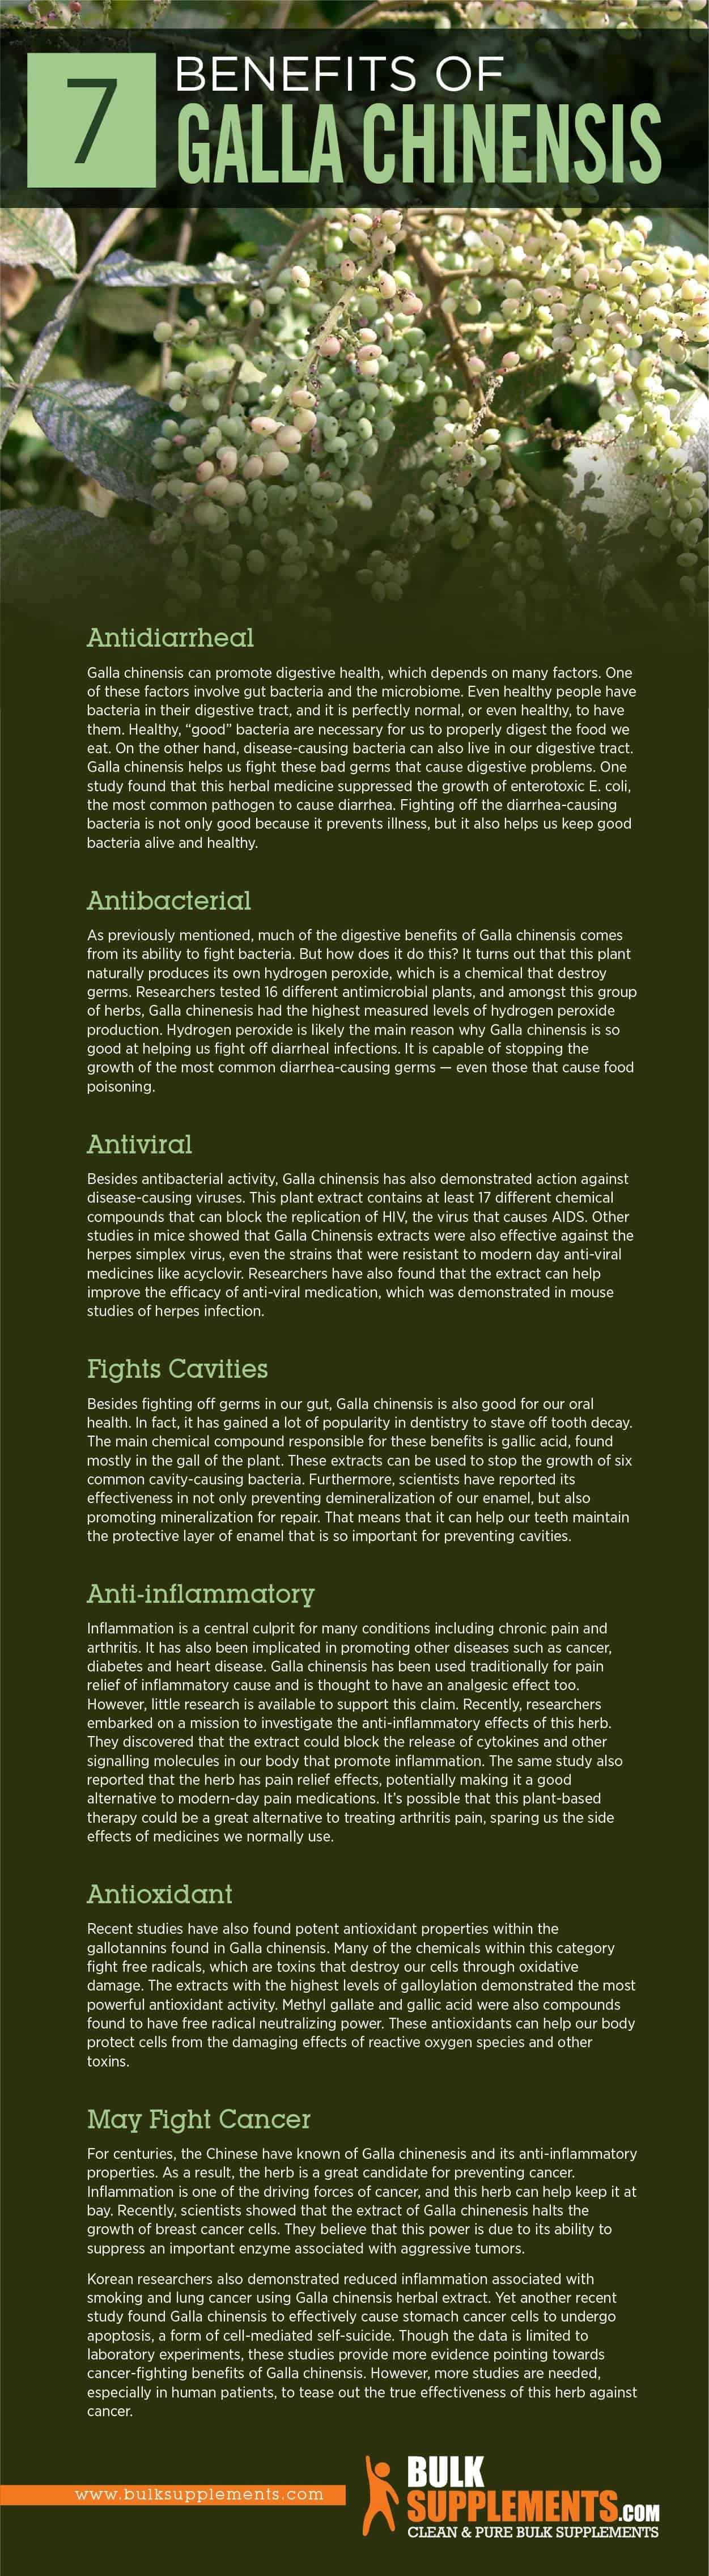 Galla Chinensis Benefits